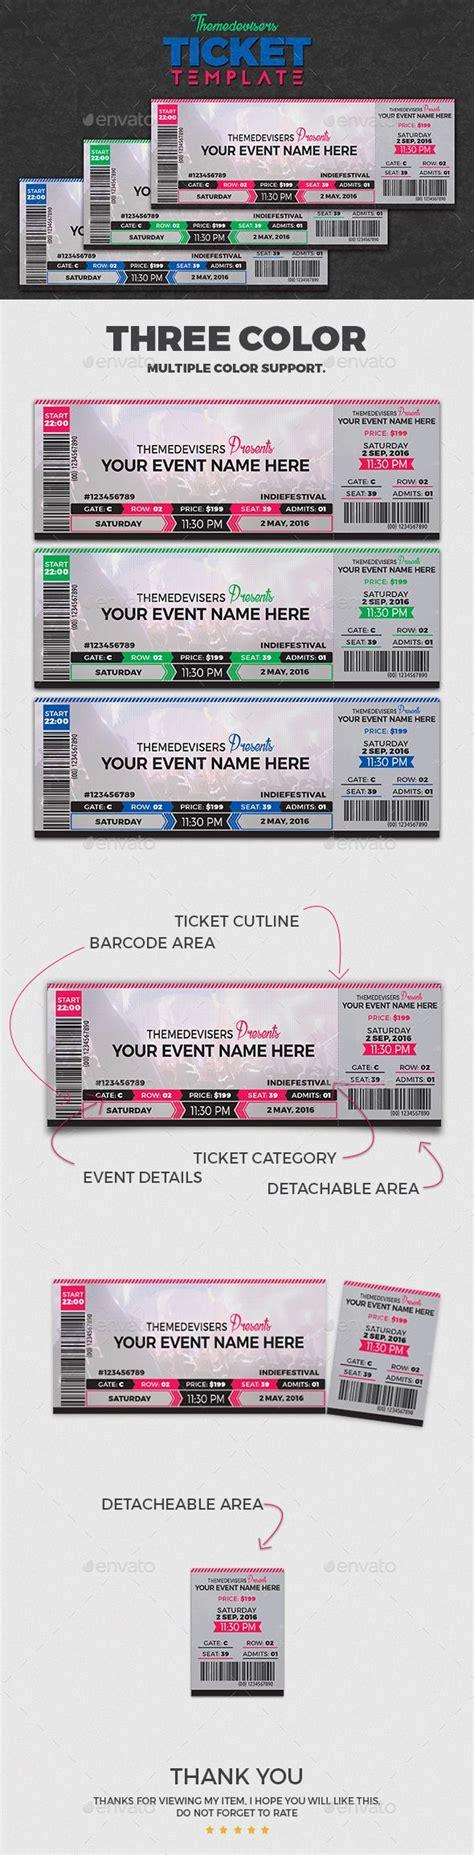 Concert Ticket Template Best 20 Ticket Template Ideas On Ticket